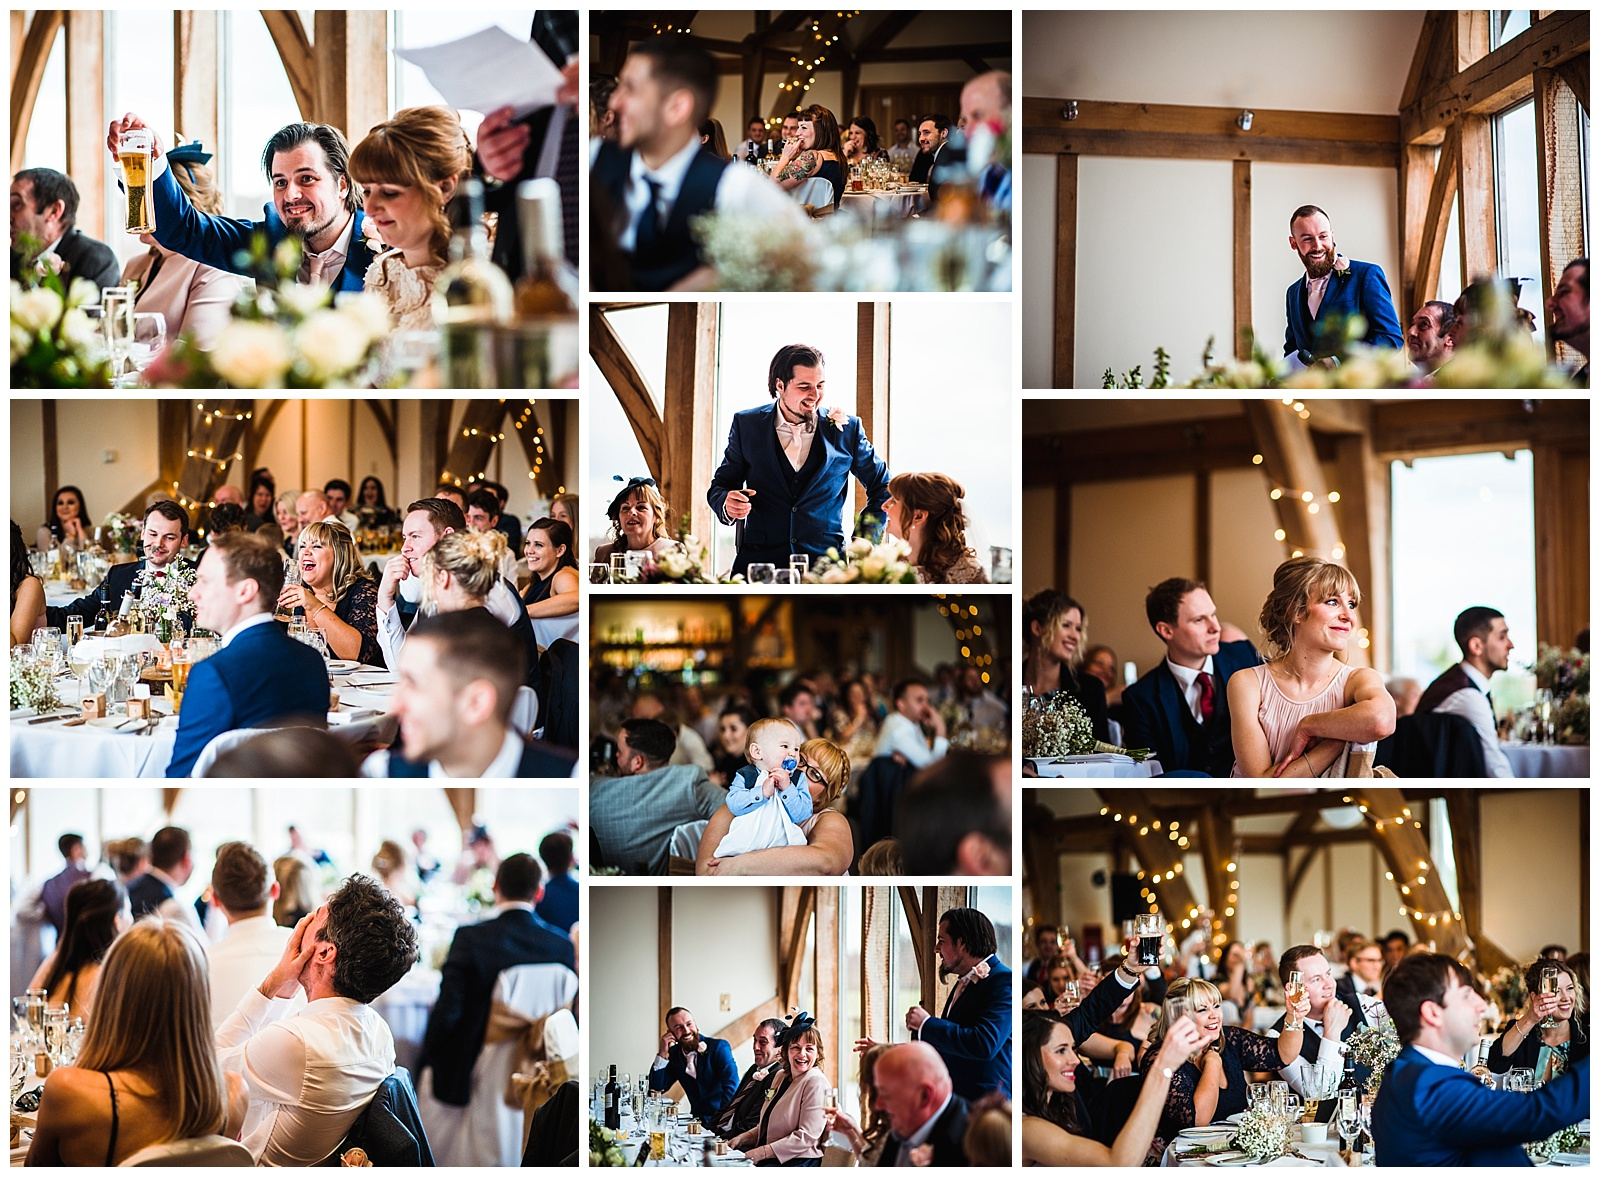 Wedding speeches at Sandburn Hall